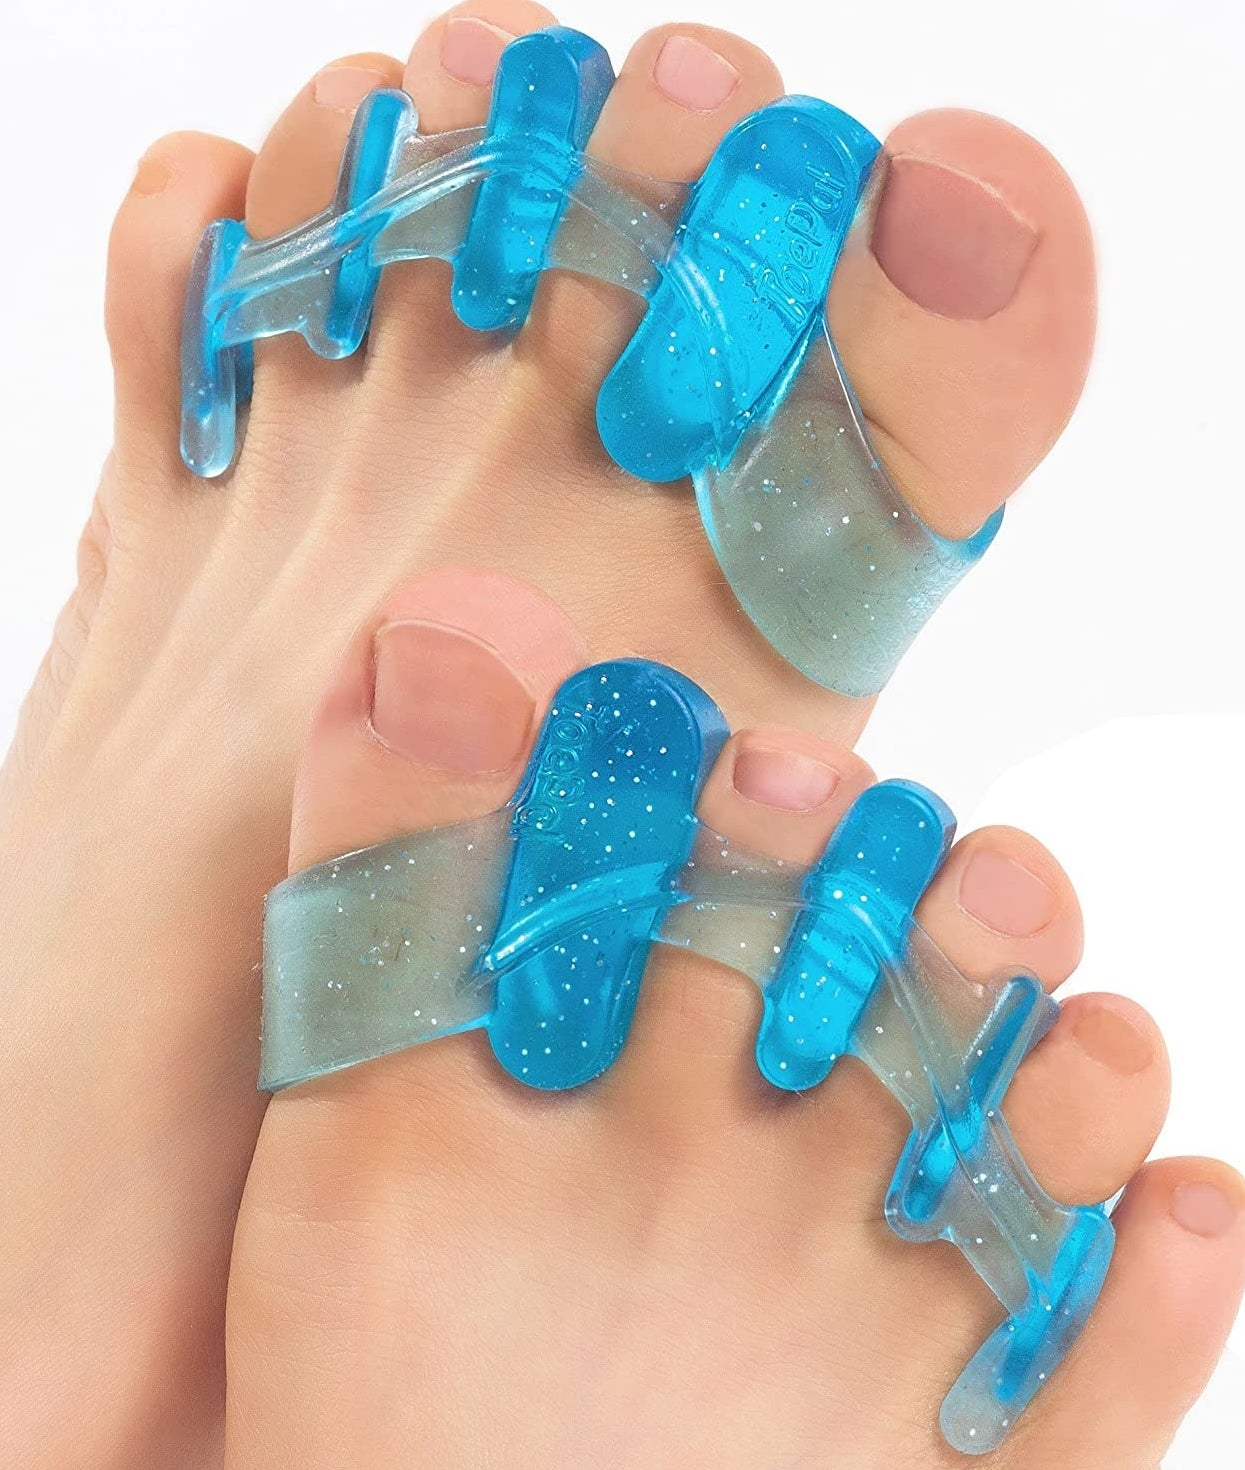 Two feet with a pair of gel separators between each toe